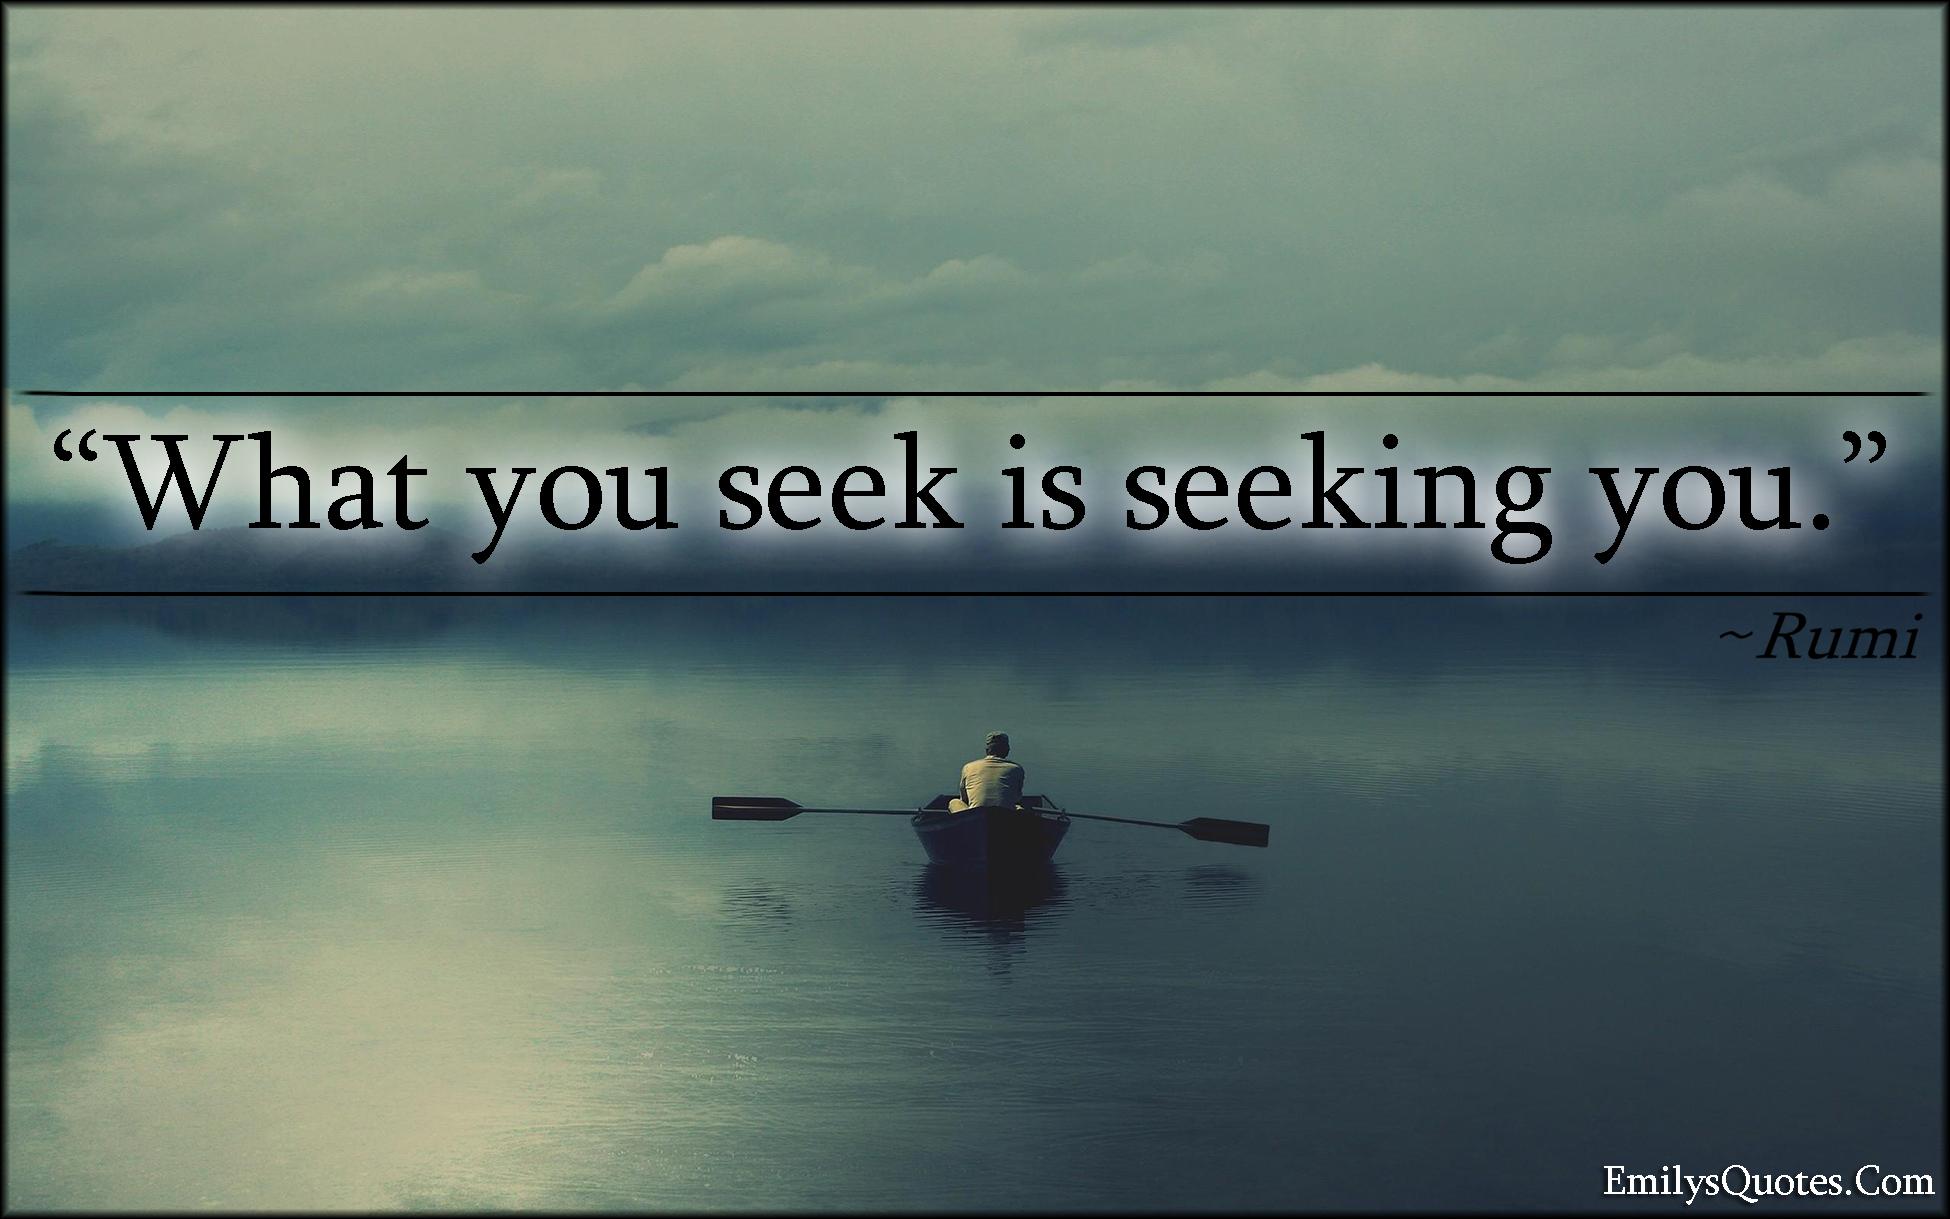 EmilysQuotes.Com - wisdom, great, amazing, seek, life, Rumi